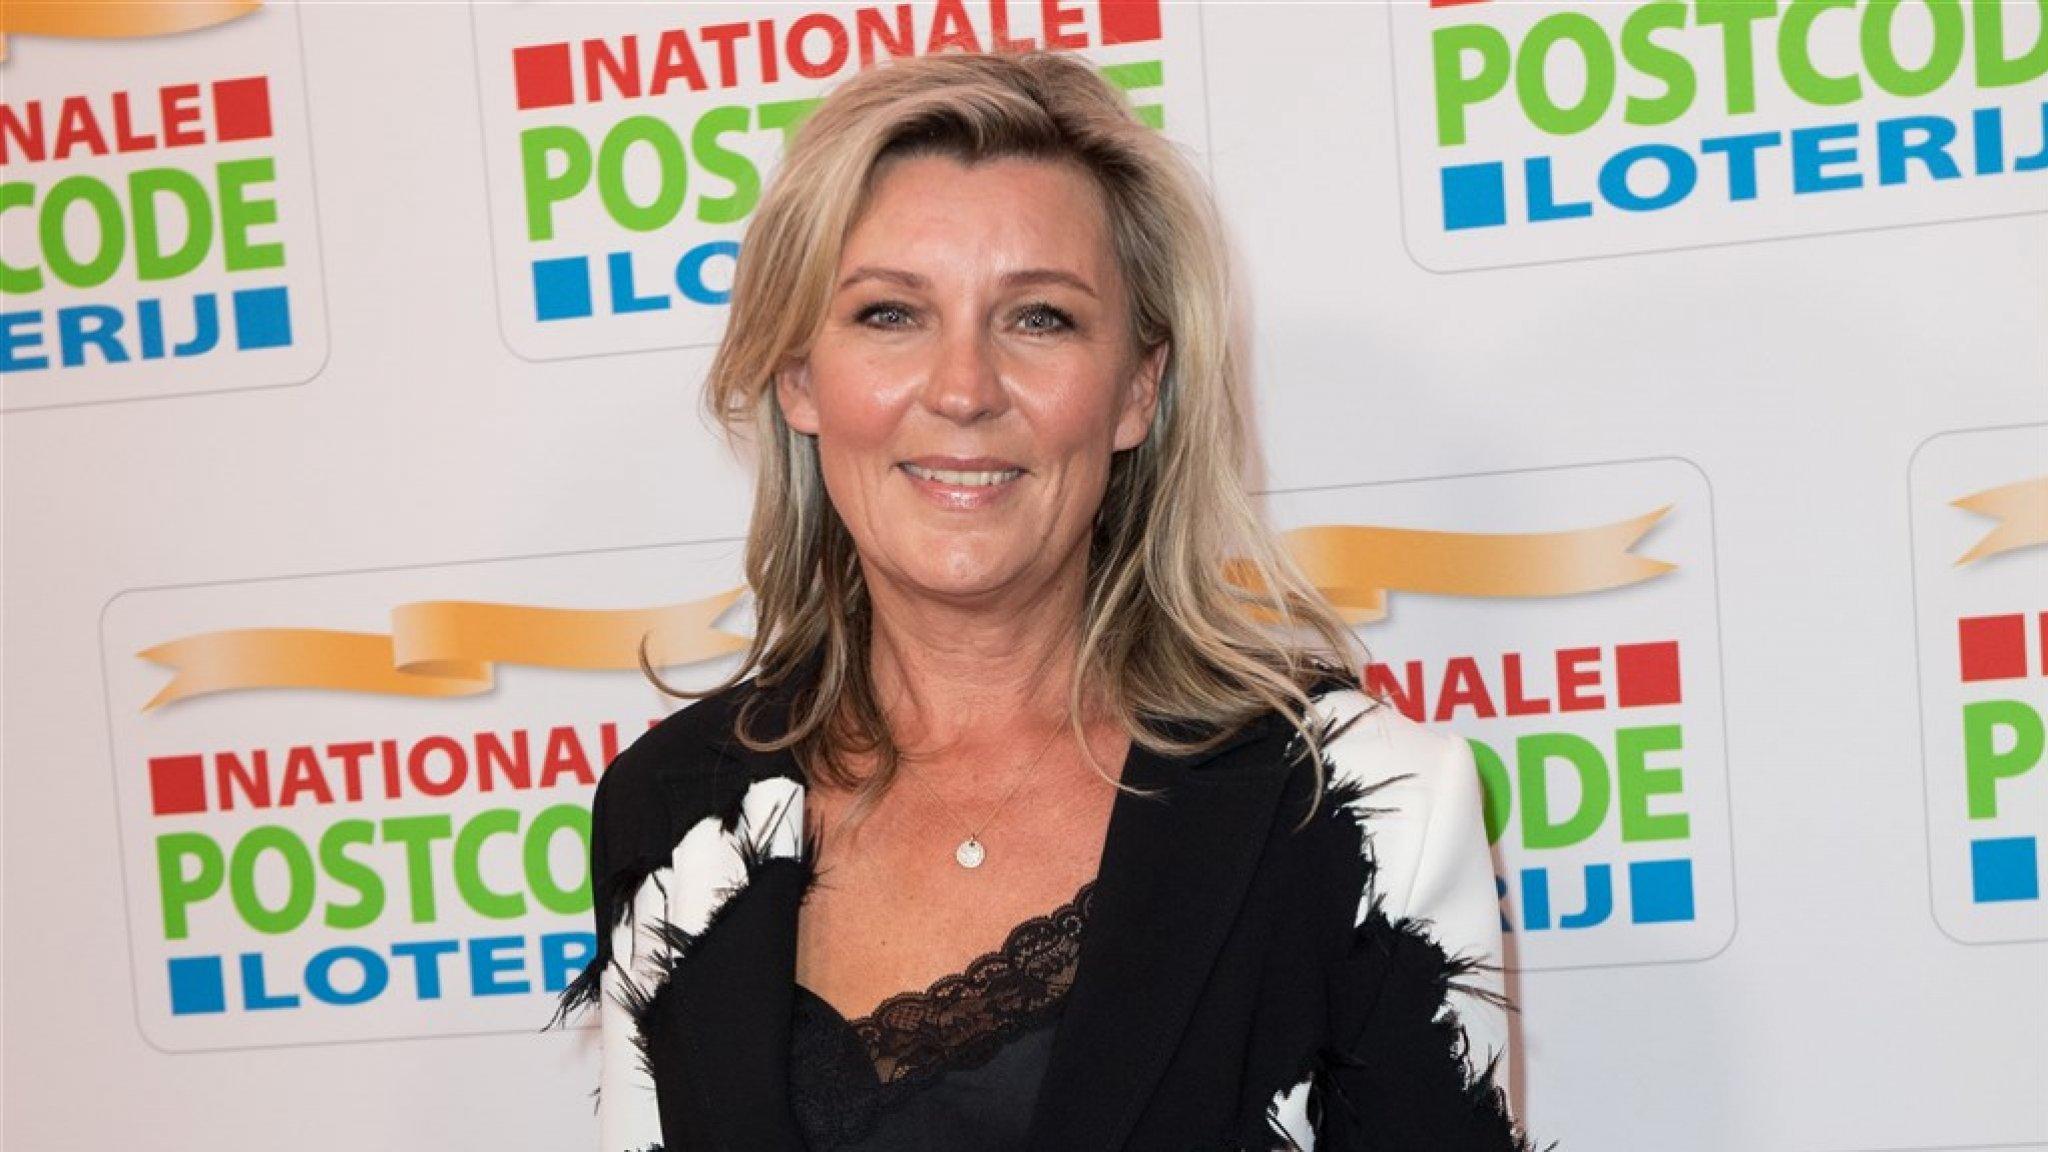 Saskia Noort is helemaal klaar met kritiek op Bridget Maasland - RTL Boulevard